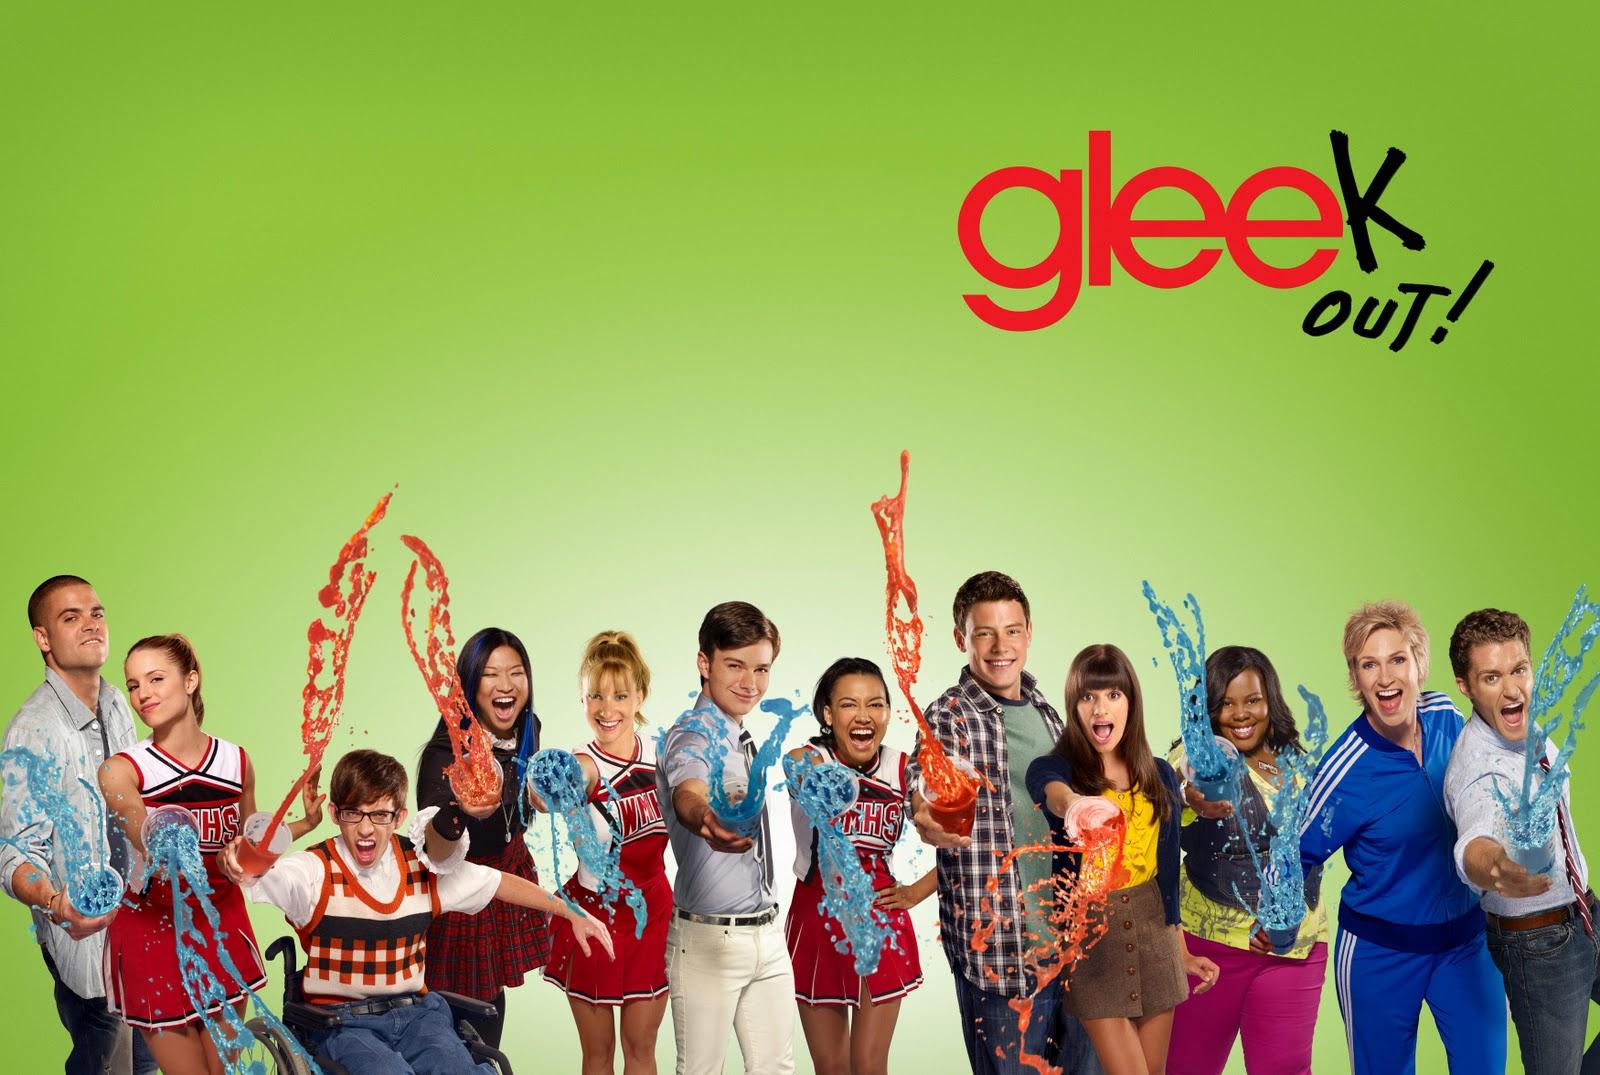 http://1.bp.blogspot.com/-EG47Cczy_Vw/TfQoZWjZmAI/AAAAAAAAAkA/P3mYuGq1Zsw/s1600/Glee+season+2.jpg